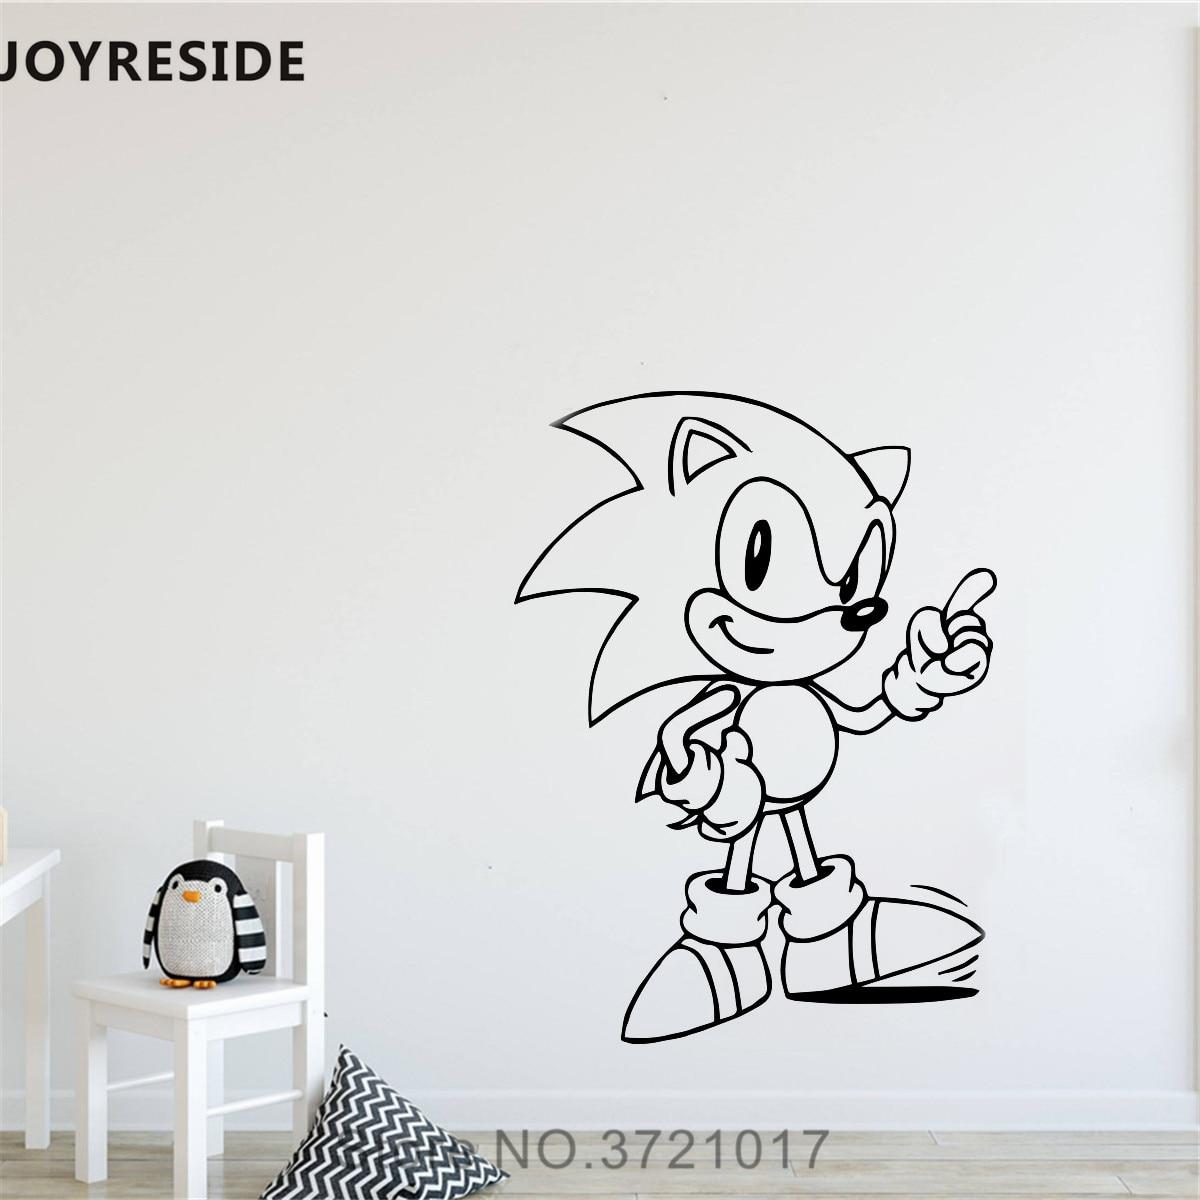 Sonic Hedgehog Sega L Vinyl Sticker Car Bin Poster Bedroom Wall Art Window Decal